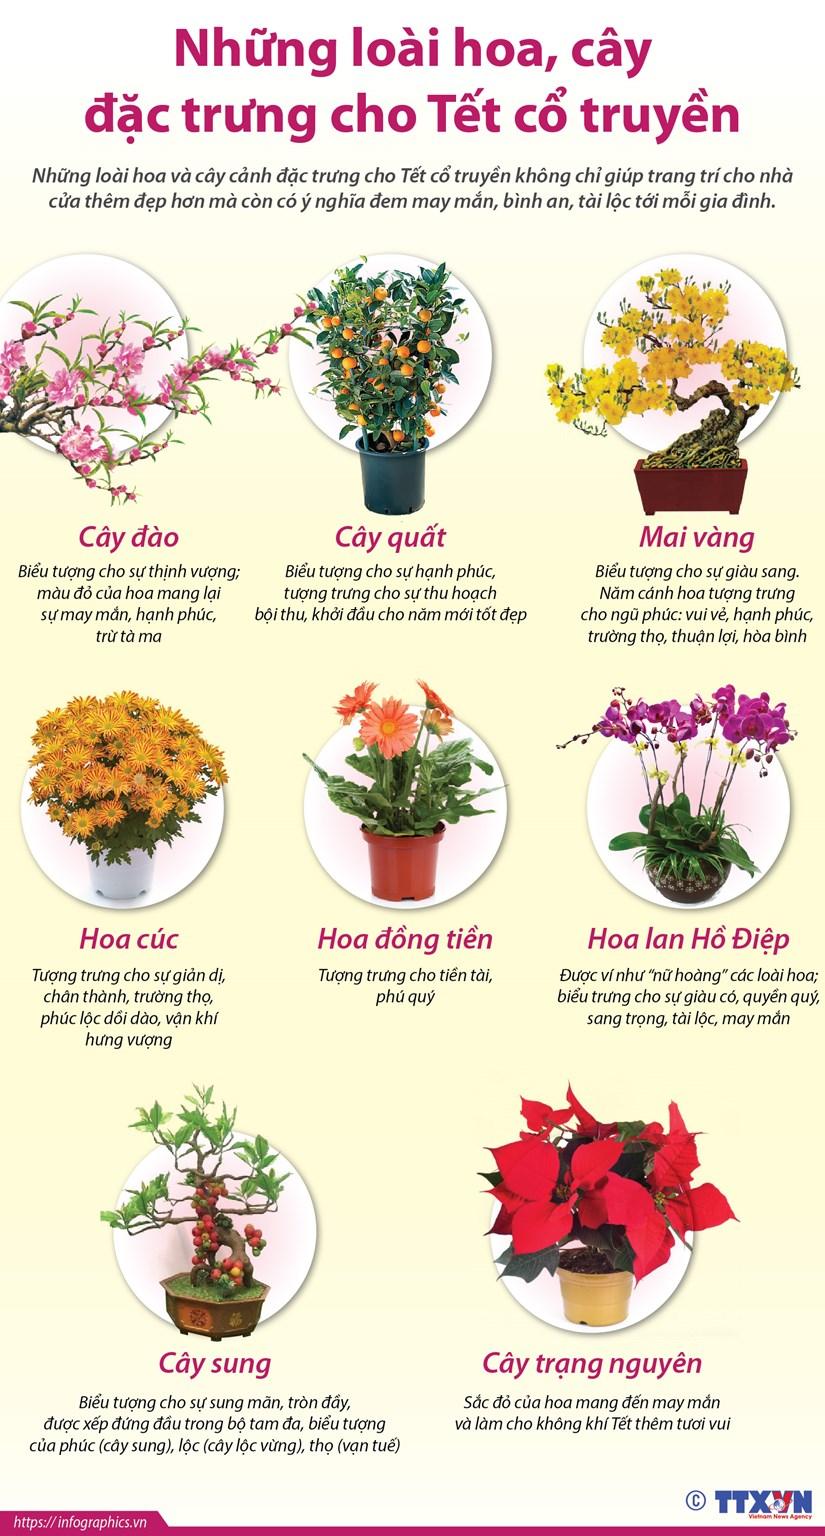 [Infographics] Nhung loai hoa, cay dac trung cho Tet co truyen hinh anh 1